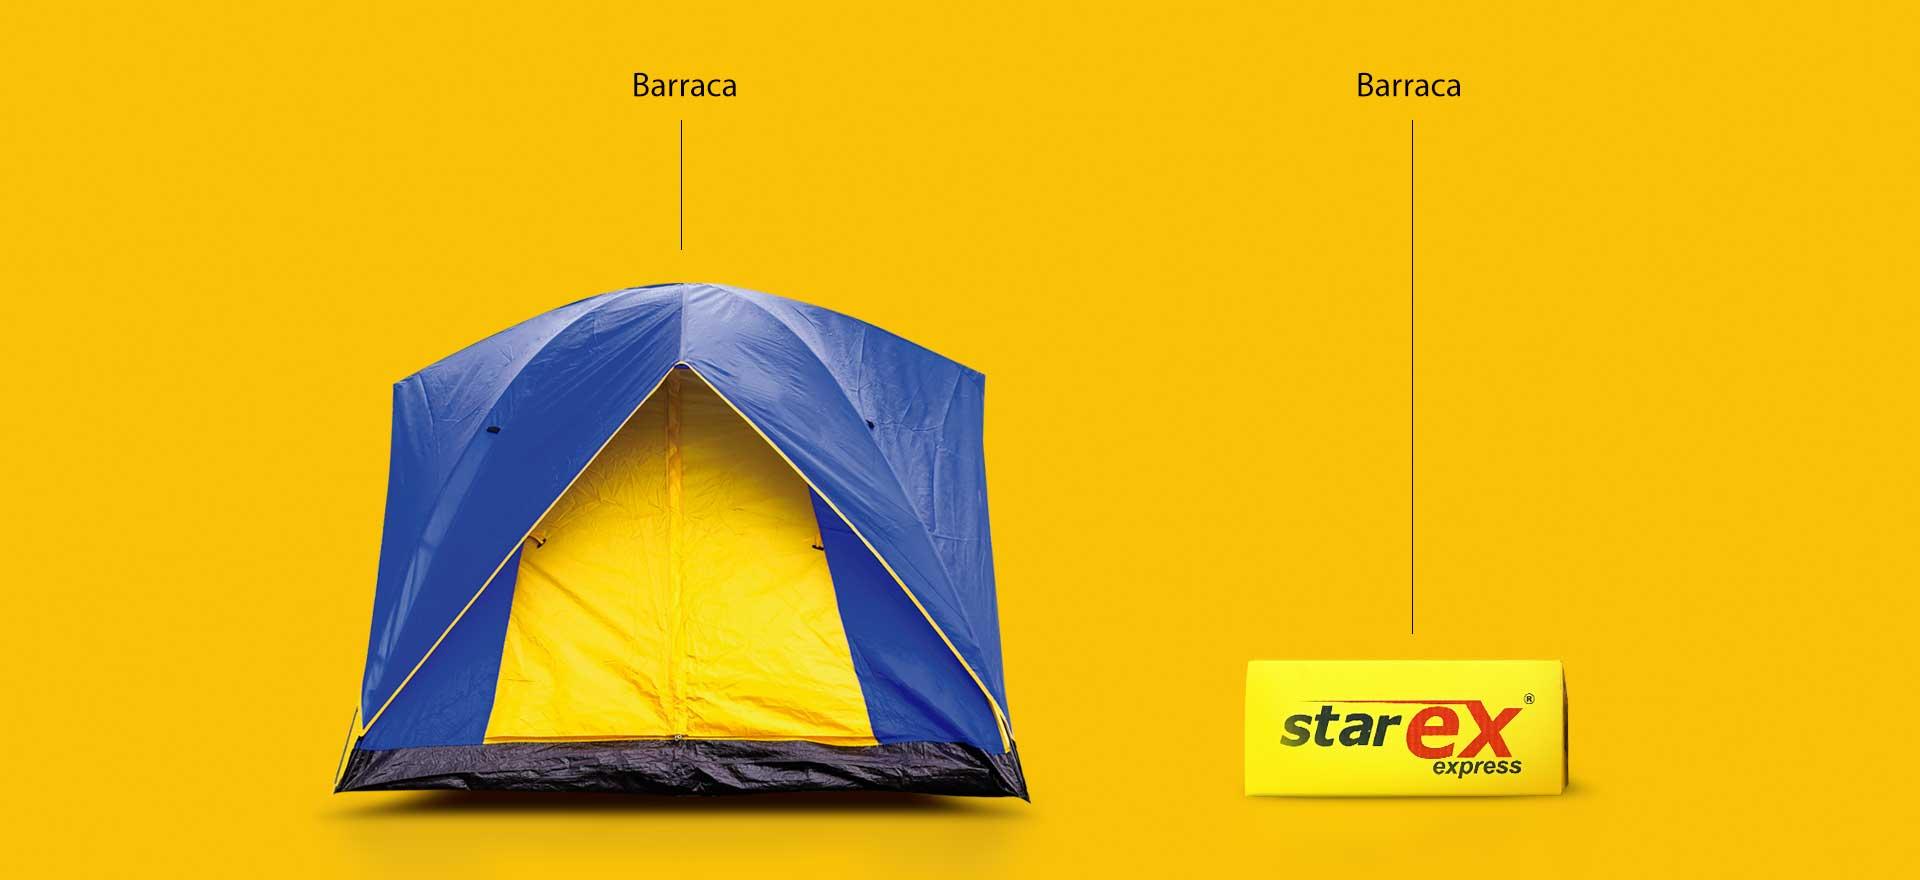 Barraca – Starex 20